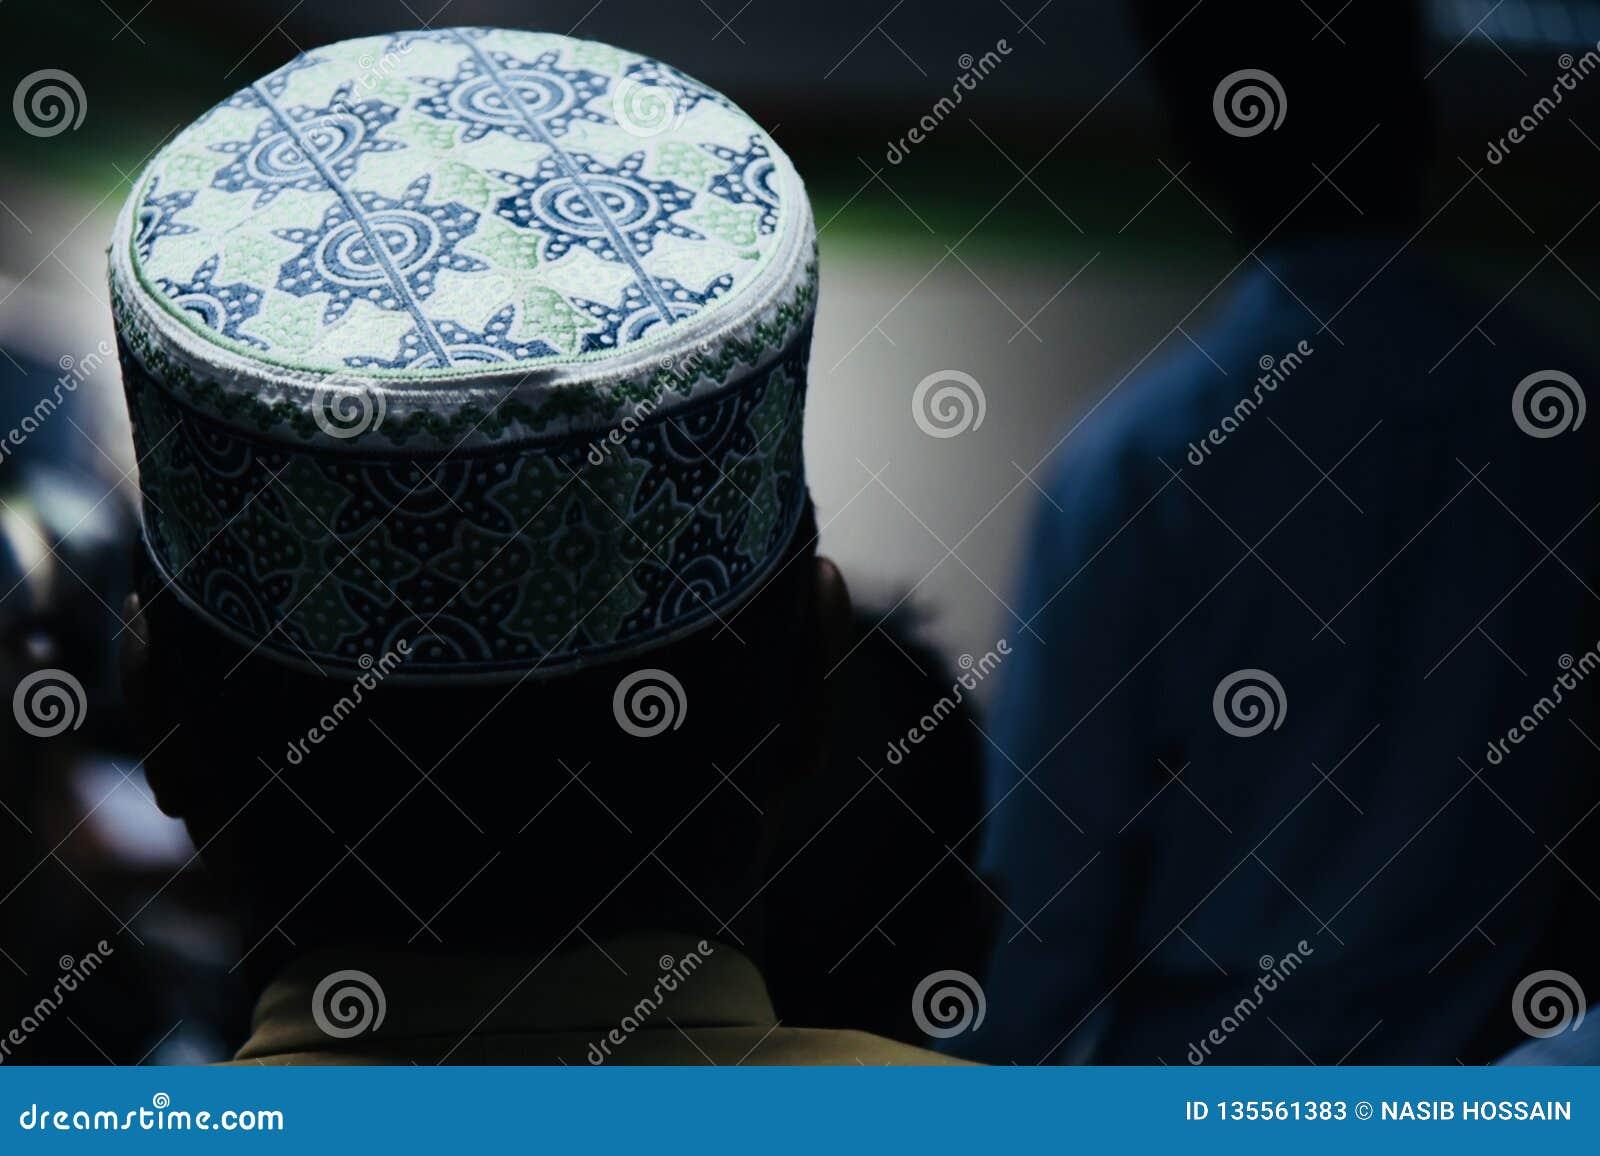 A round shape muslim cap unique photo